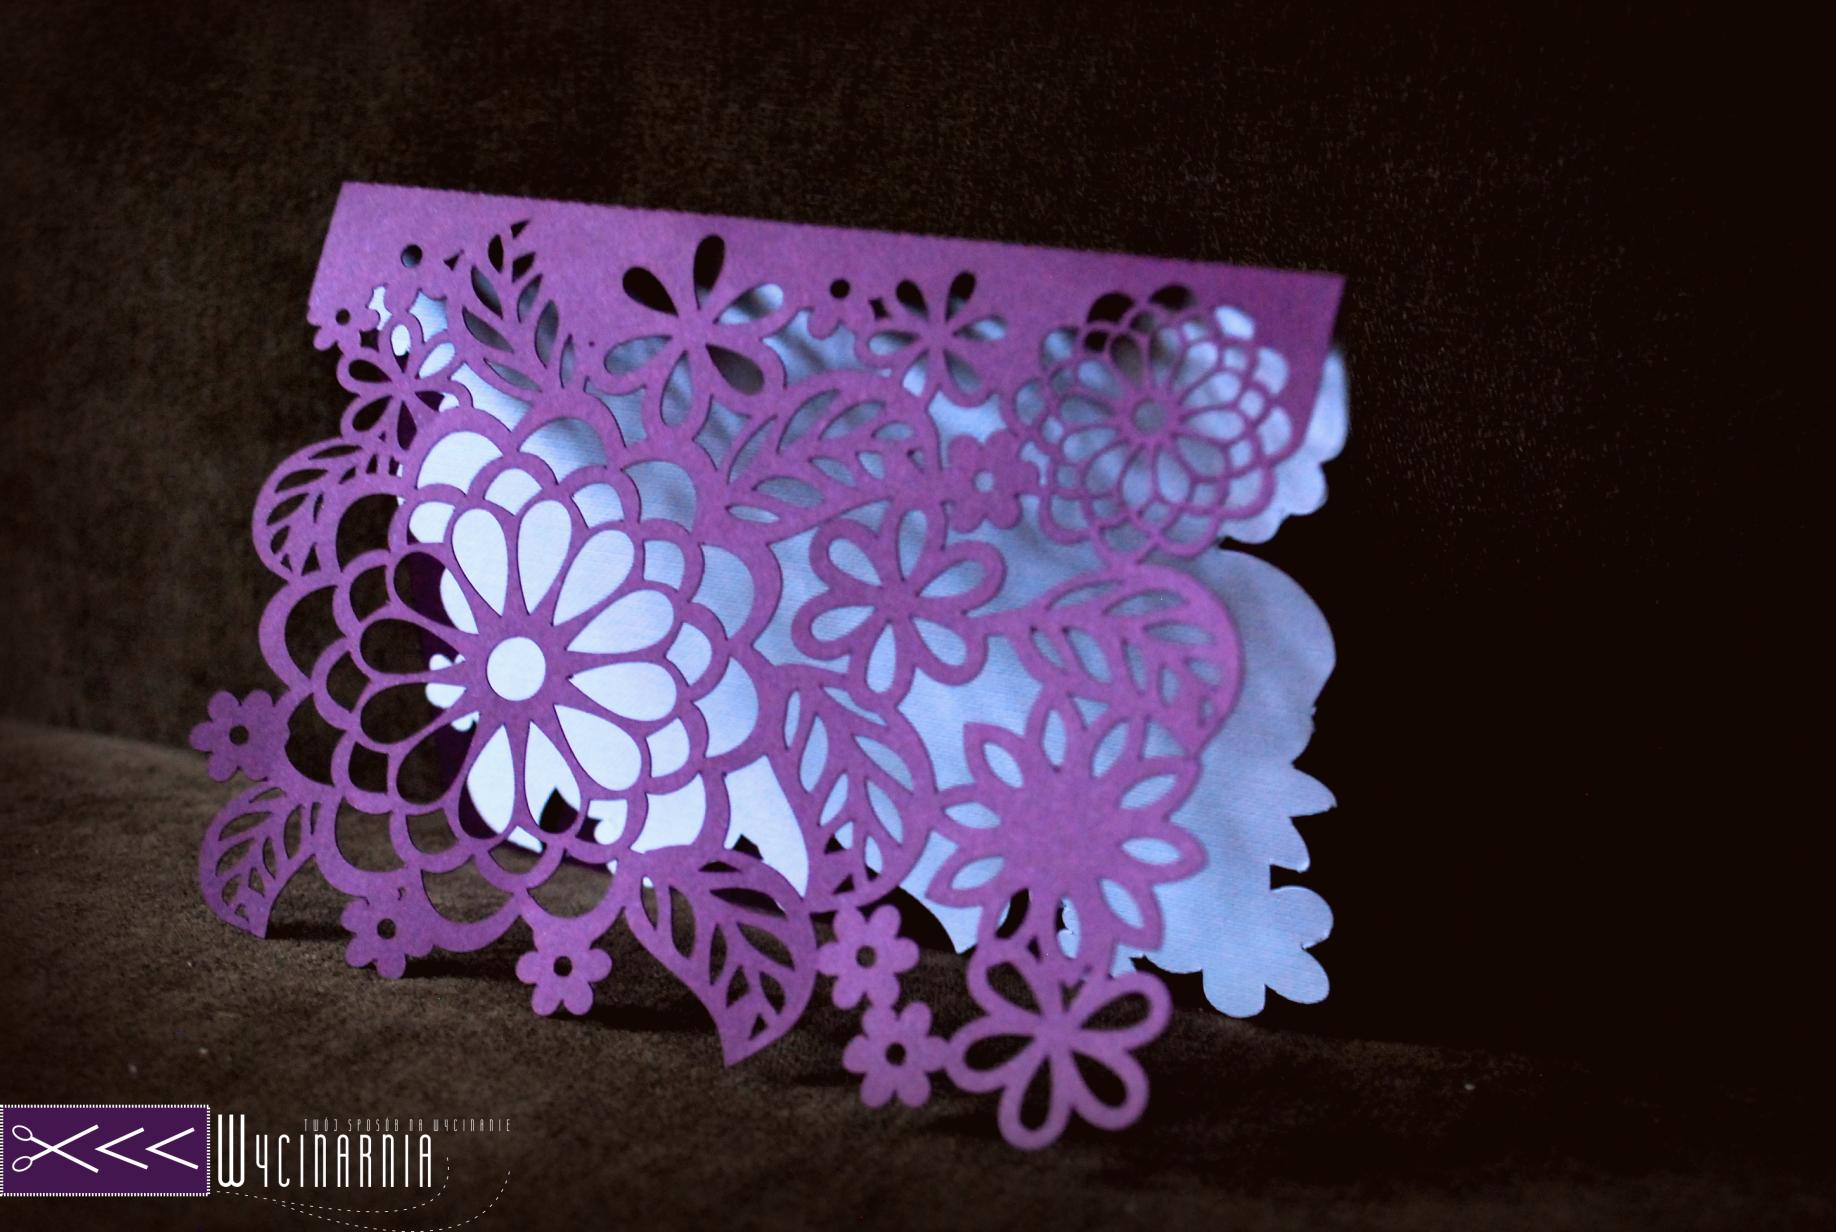 Delikatne wzory – Silhouette